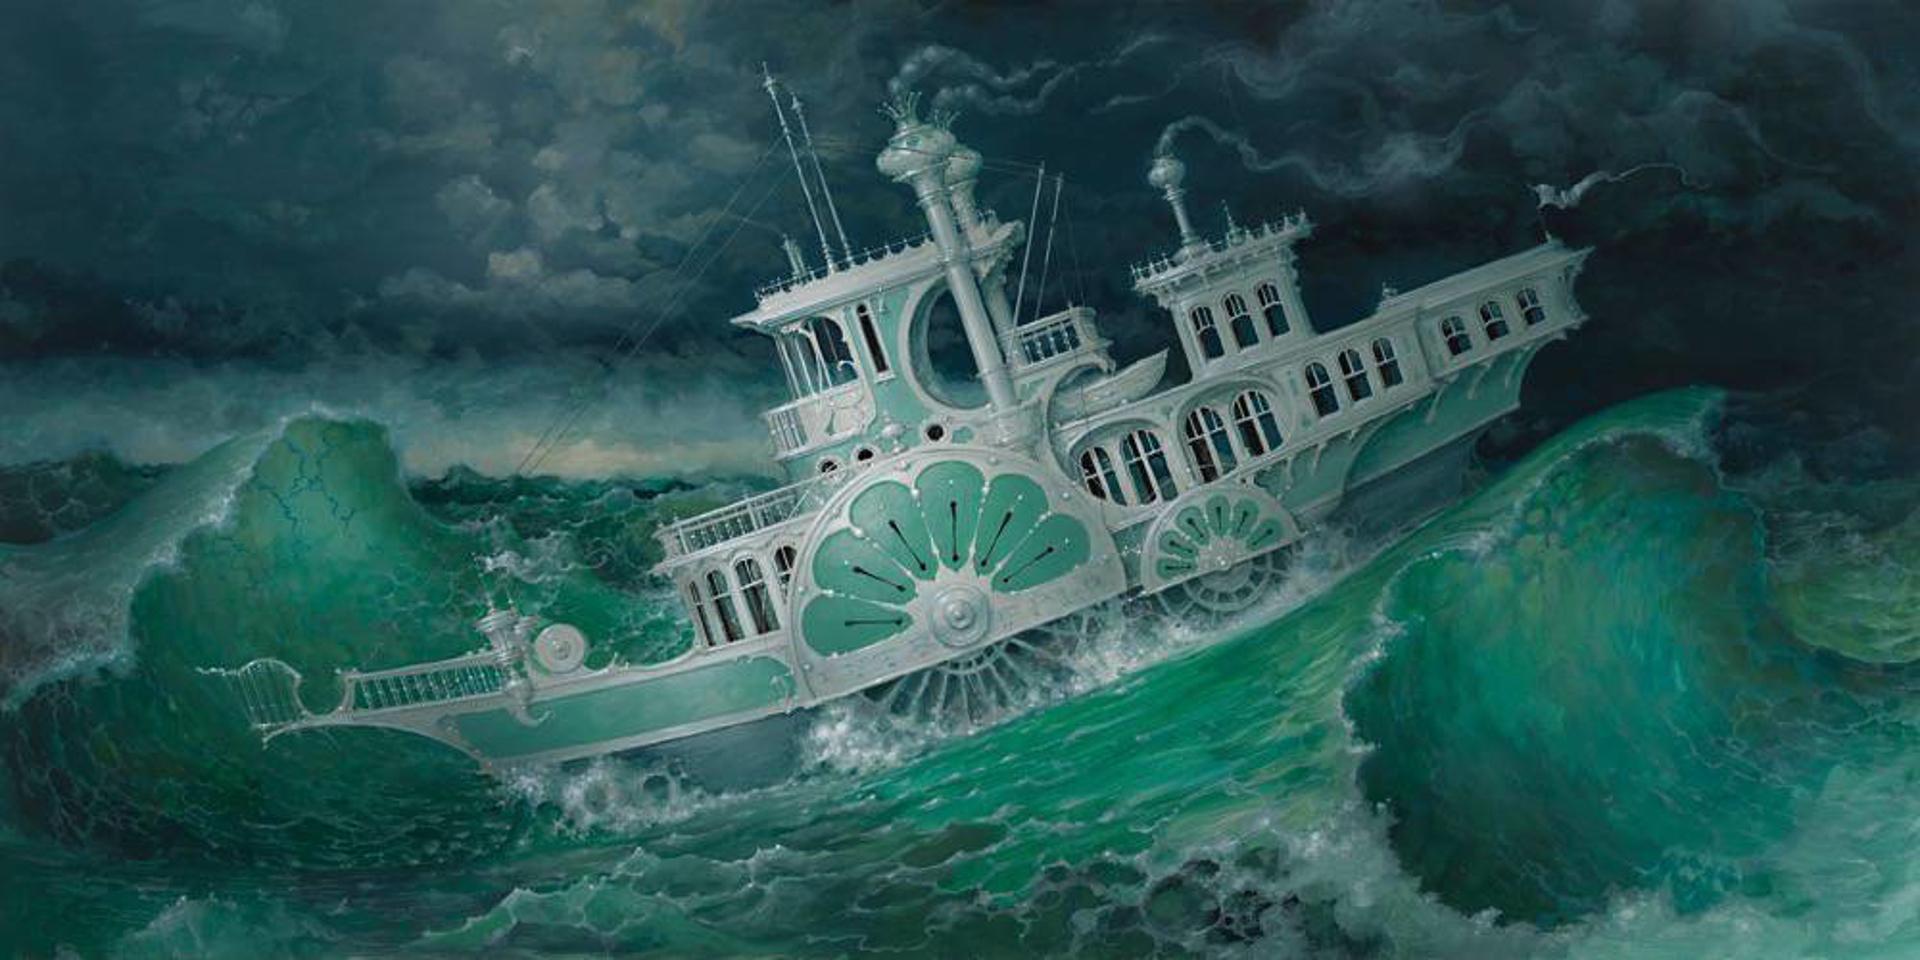 Intrepid Dreamer by Daniel Merriam